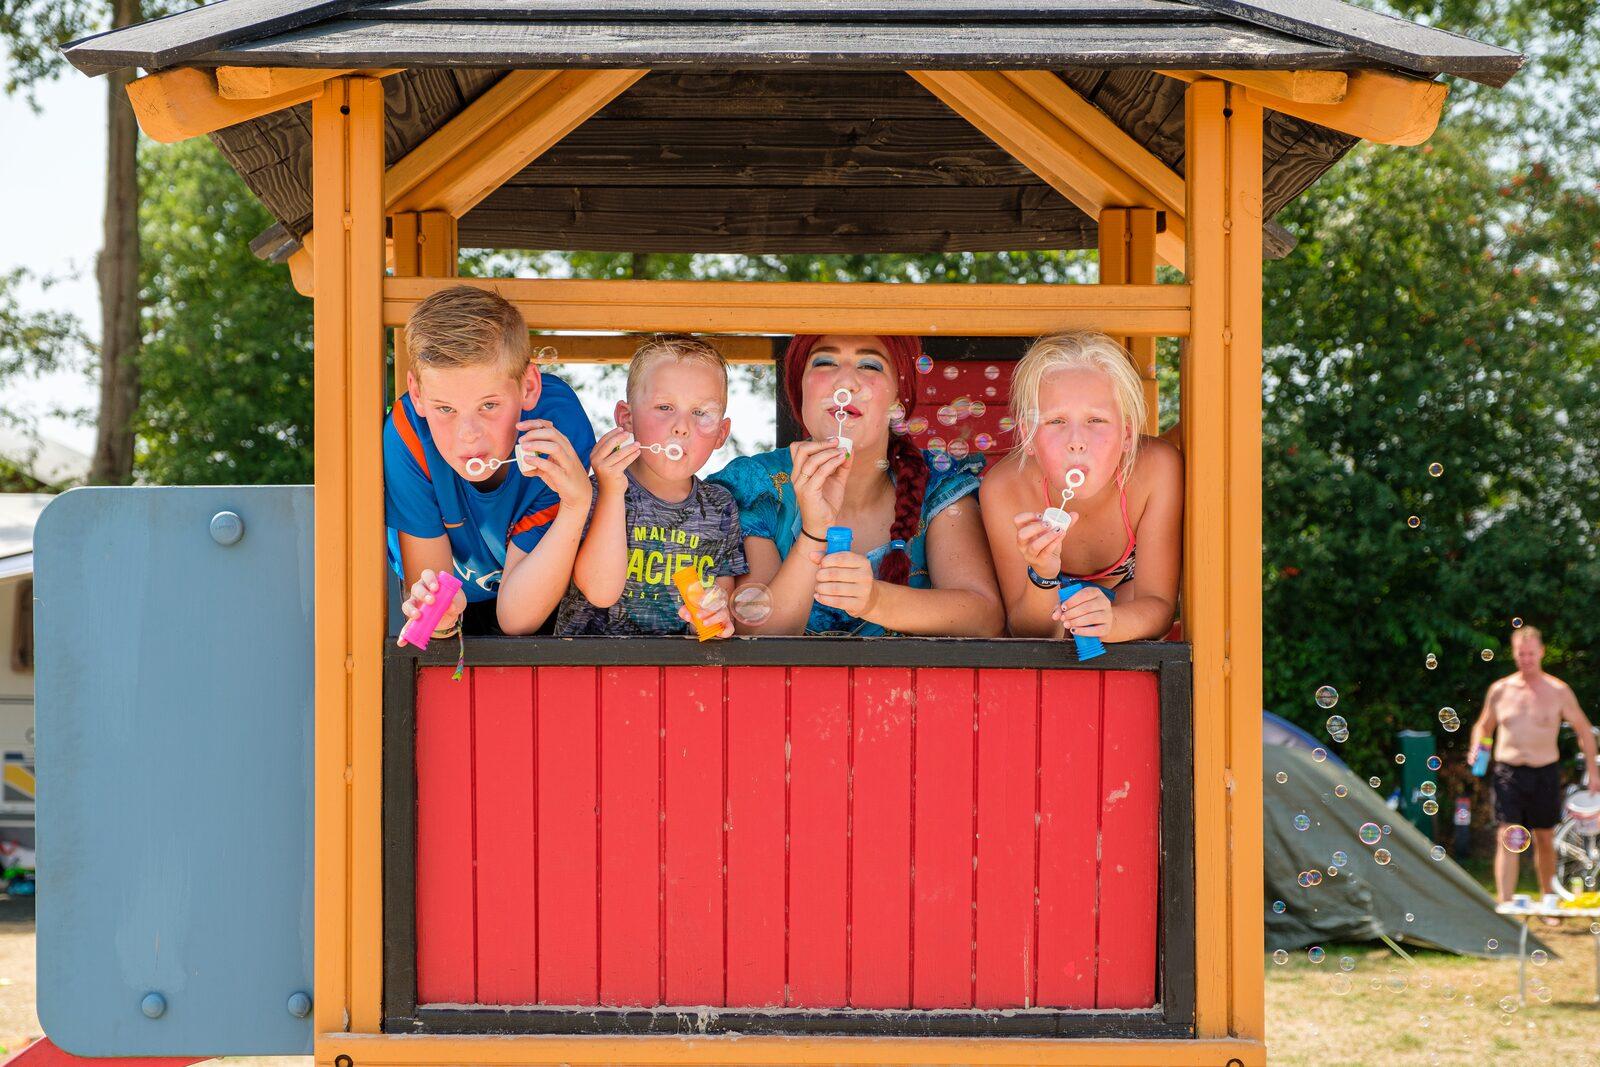 Fünf-Sterne-Zeltplatz in den Niederlanden